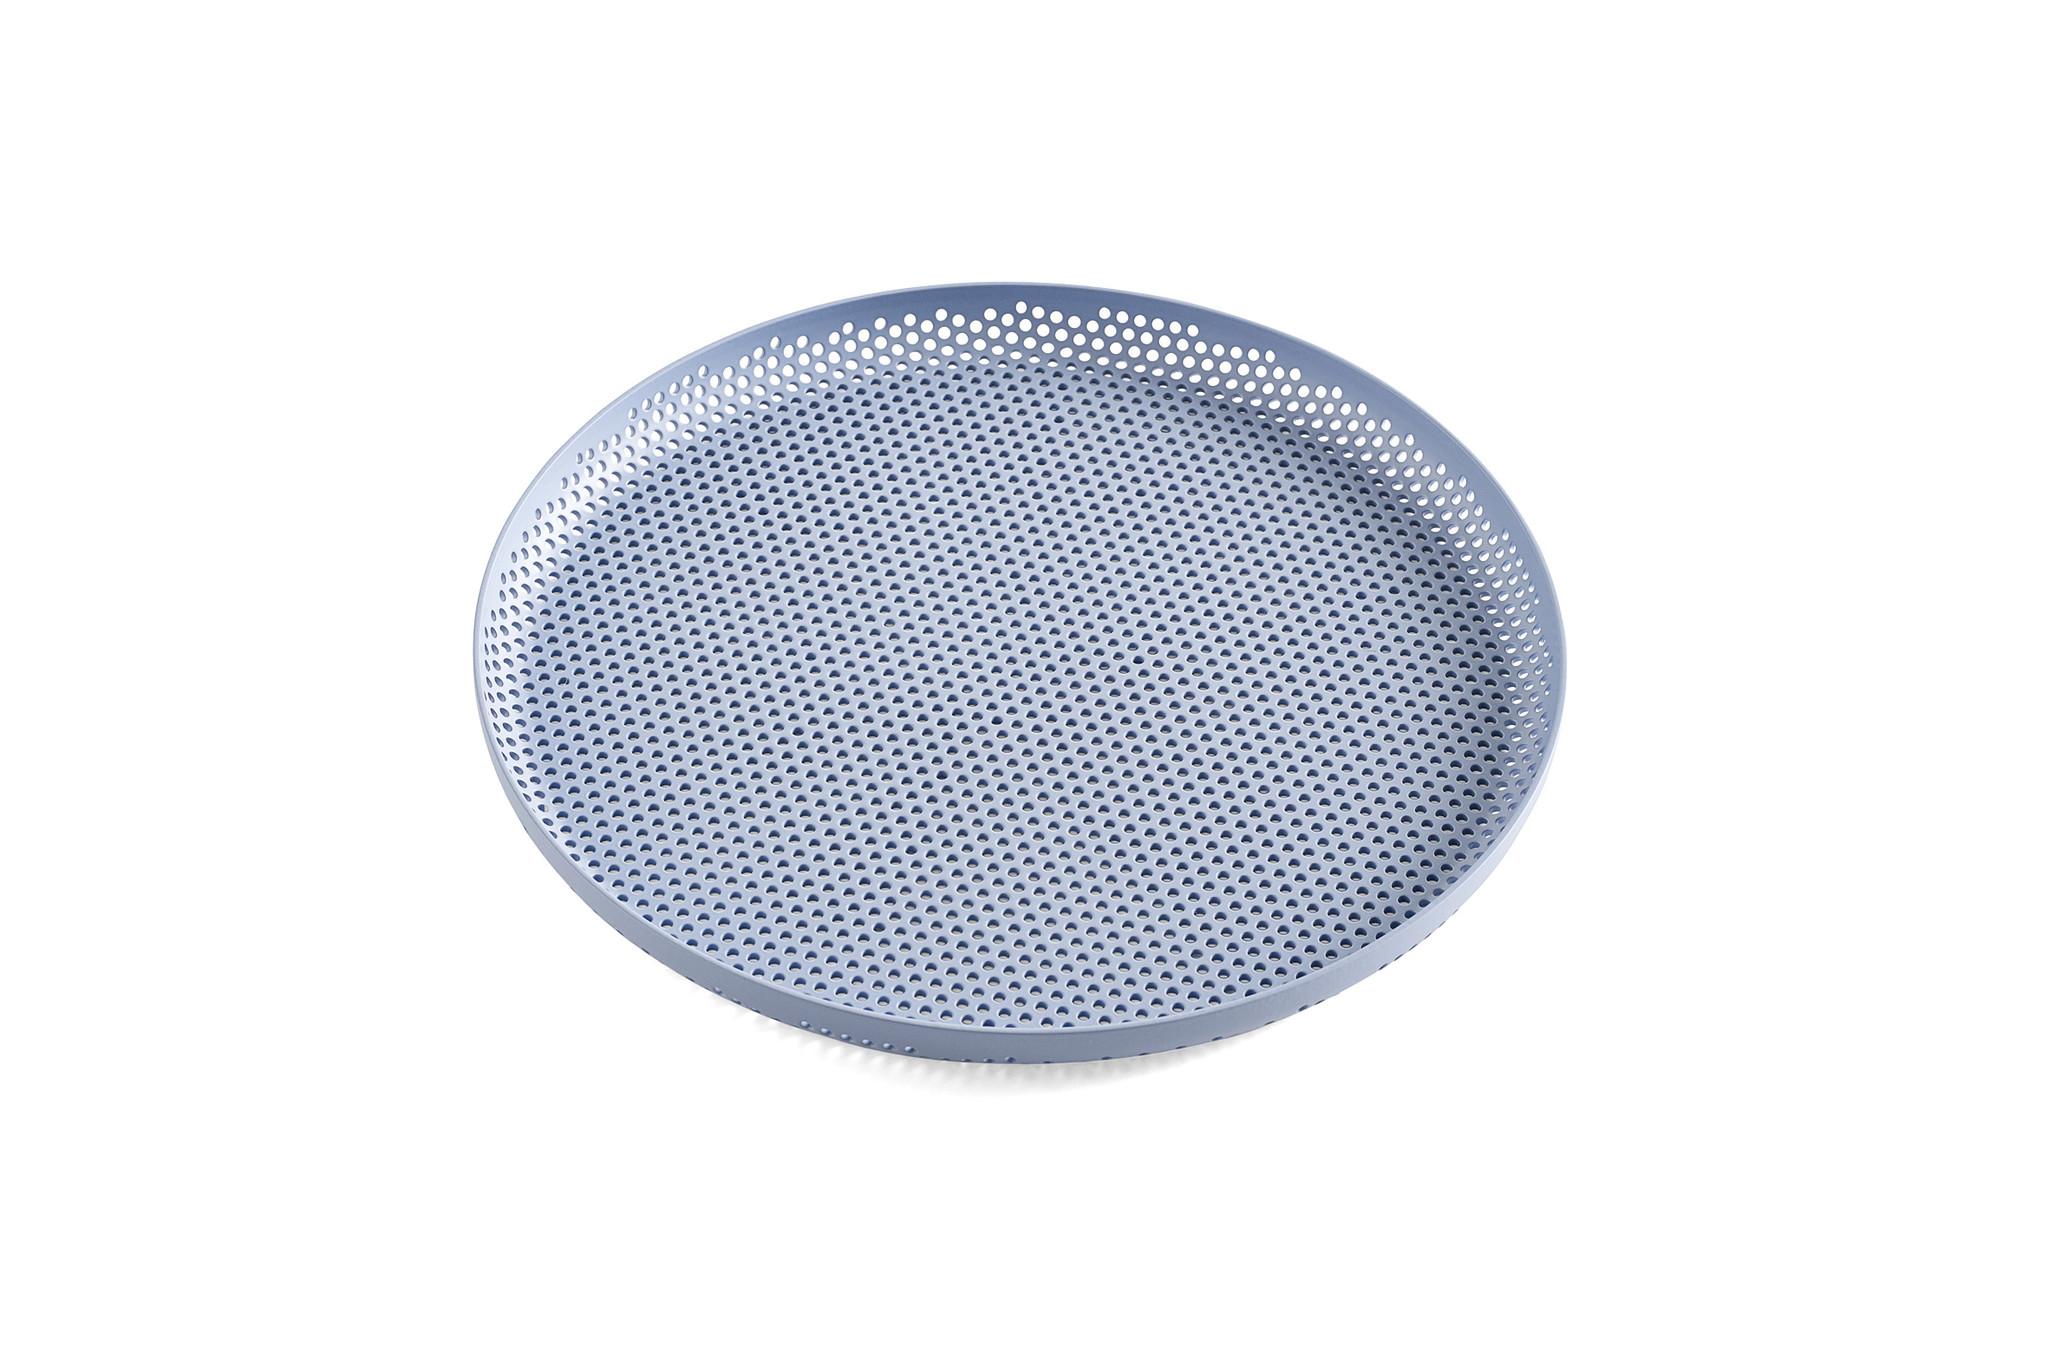 Perforated Tray - Medium-1